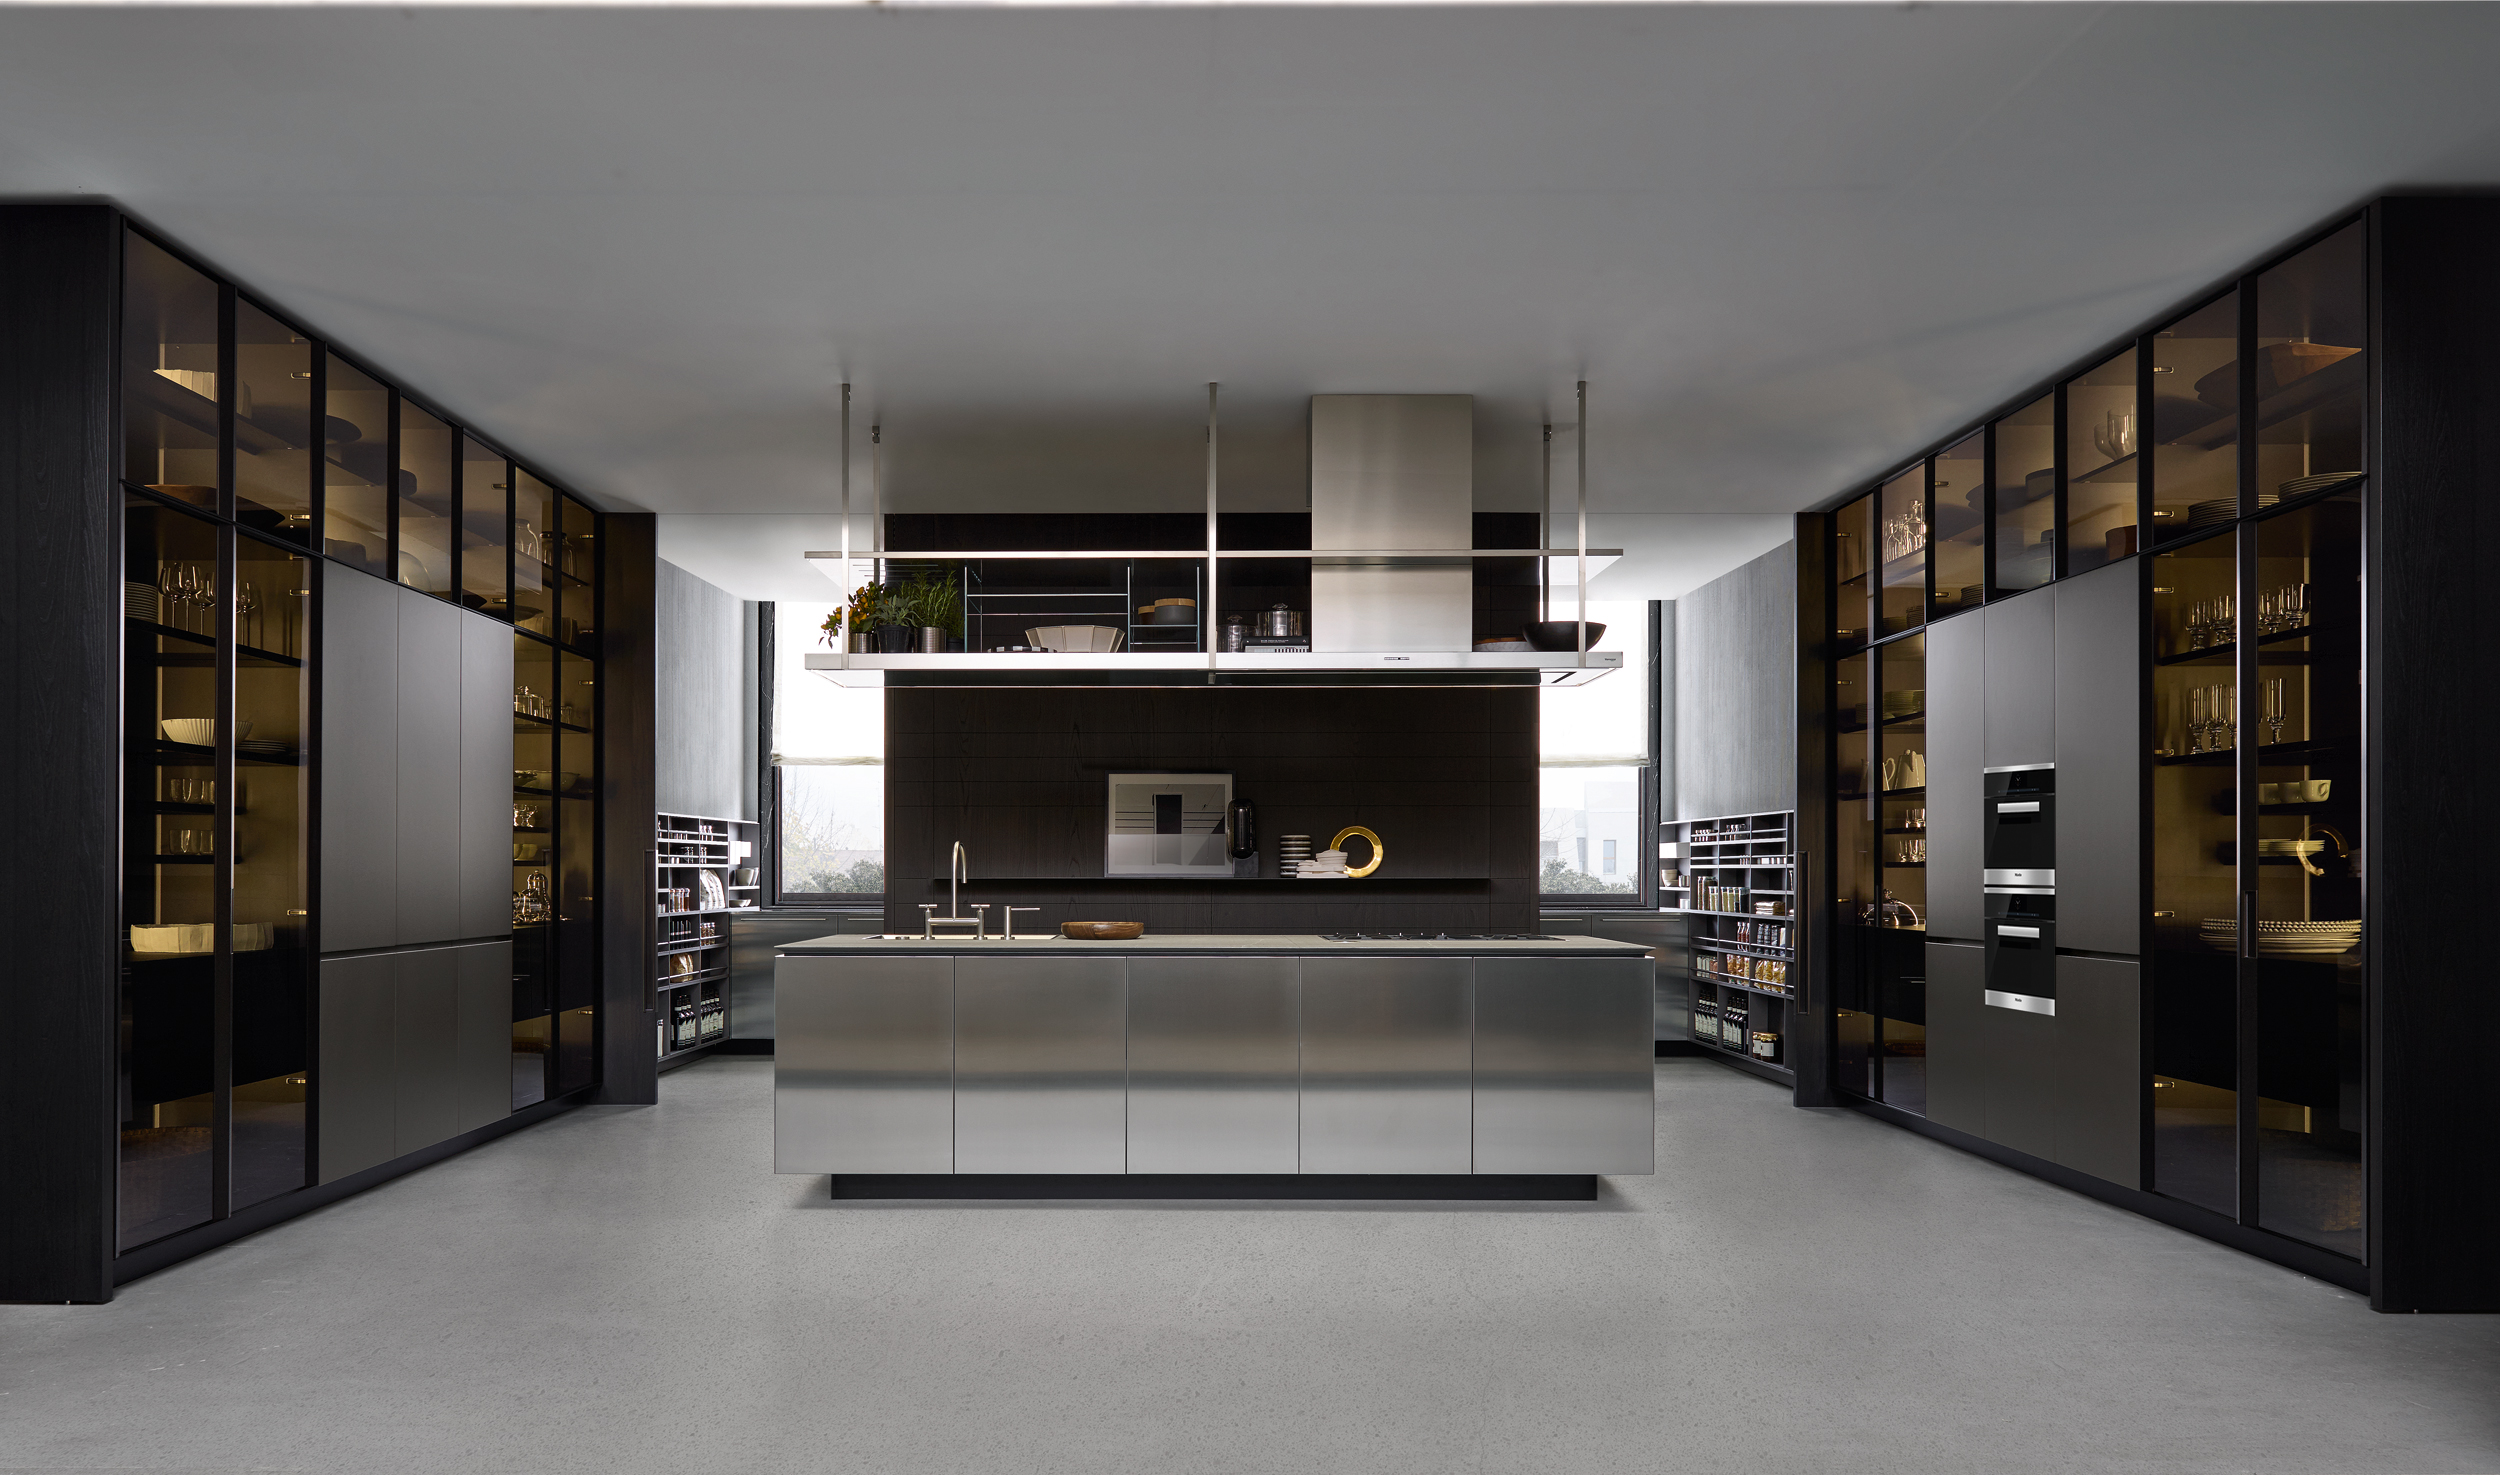 The Varenna Artex kitchen.